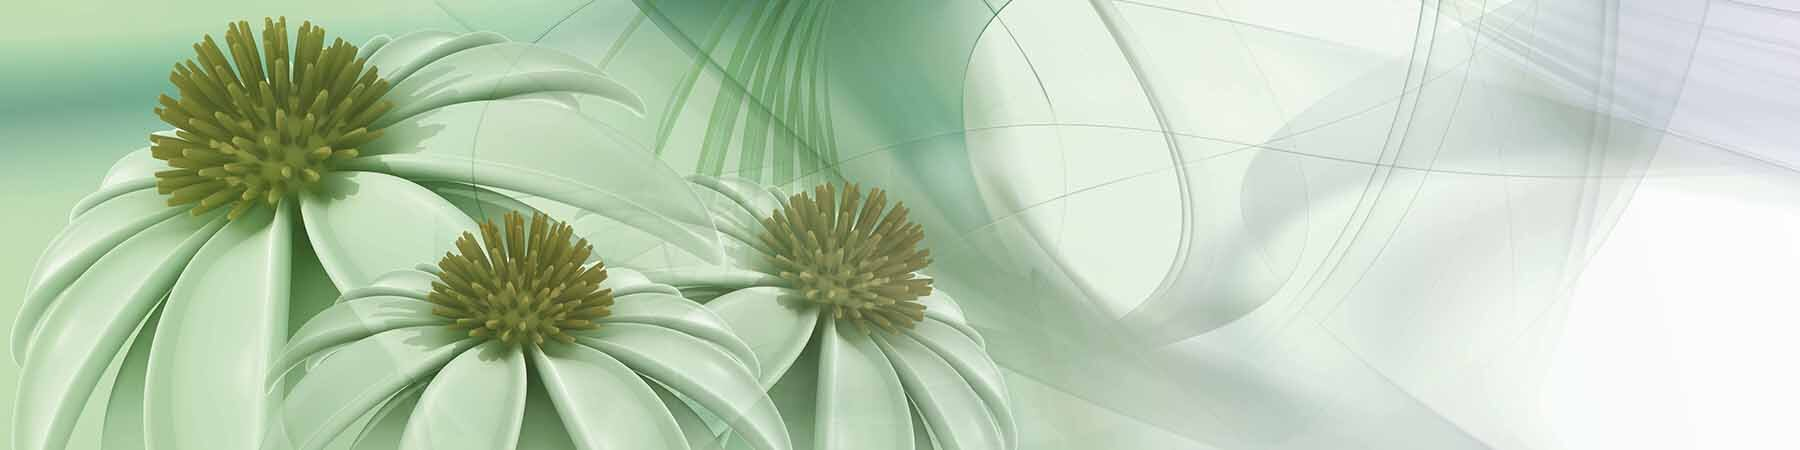 PlateART Wandverkleidung mit Motiv Blüten